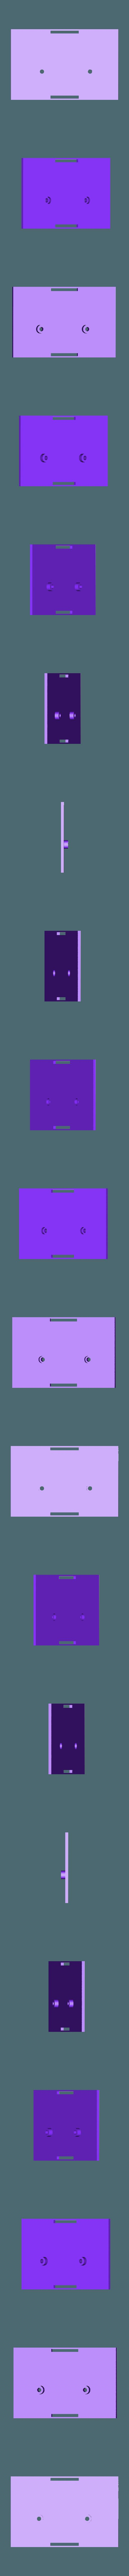 FT009_BATTERY_MOUNT.stl Download free STL file FT009 BATTERY SUPPORT FOR GREATER BATTERY • 3D printer template, baptisterebillard